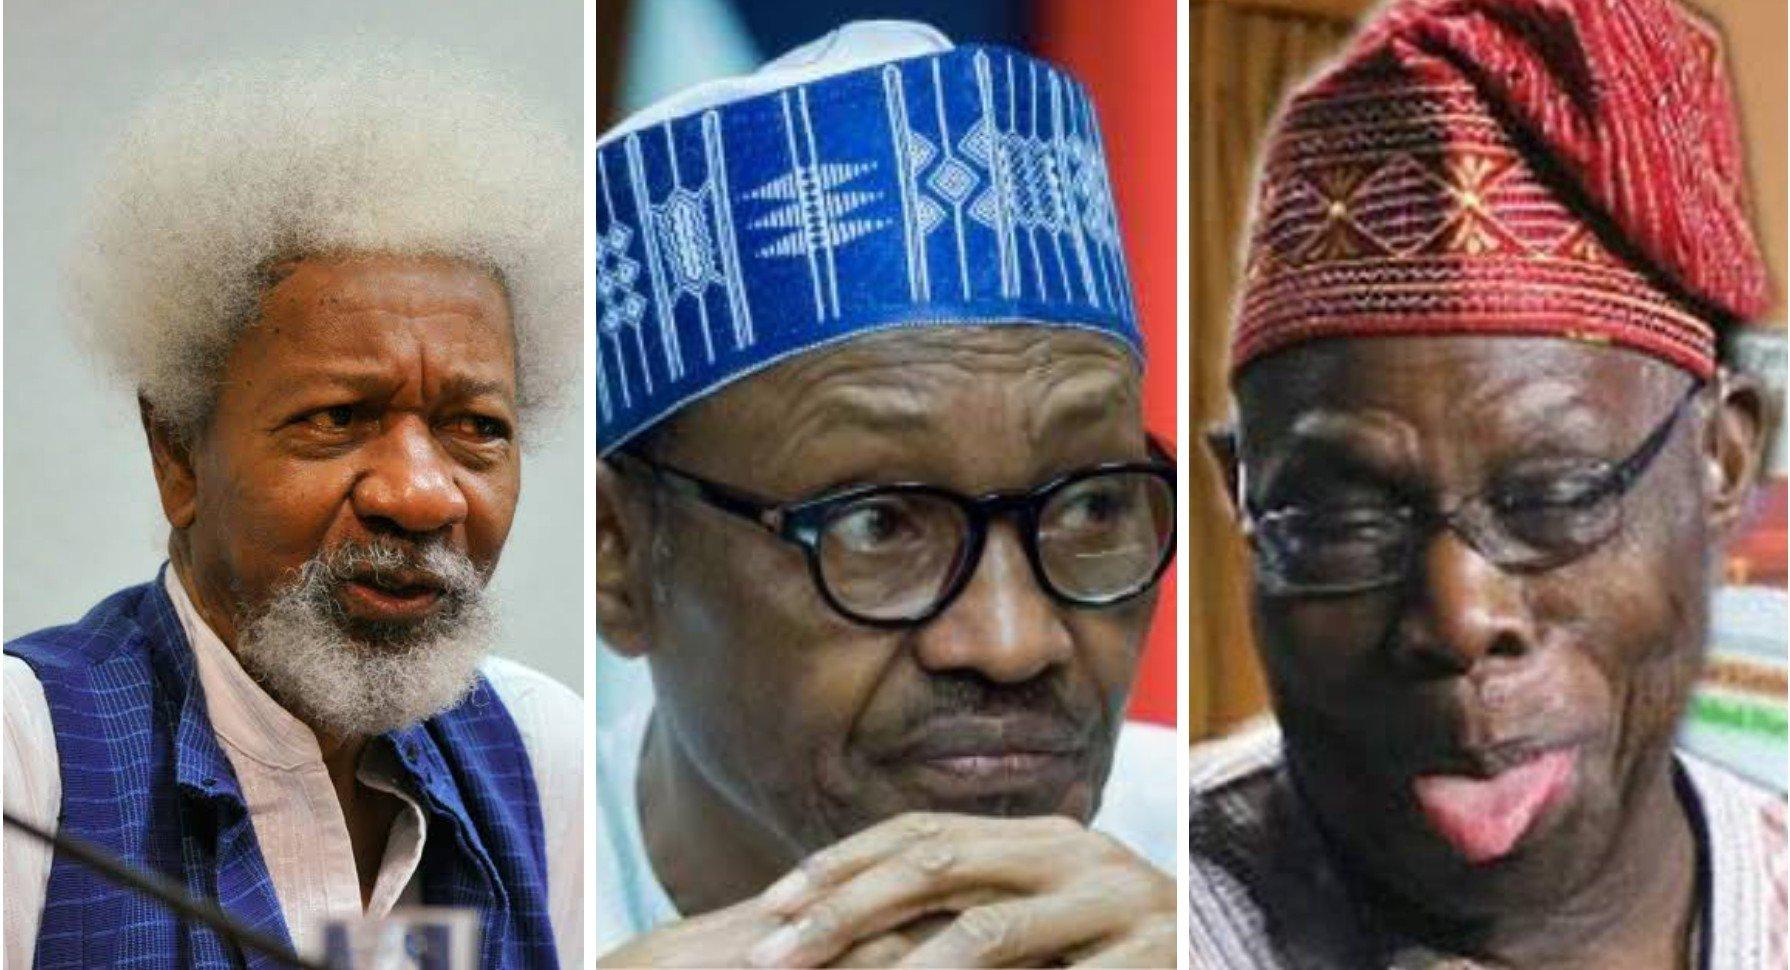 Wole Soyinka Backs Obasanjo's Claims, Says Nigeria Is Divided Like Never Before Under Buhari 1